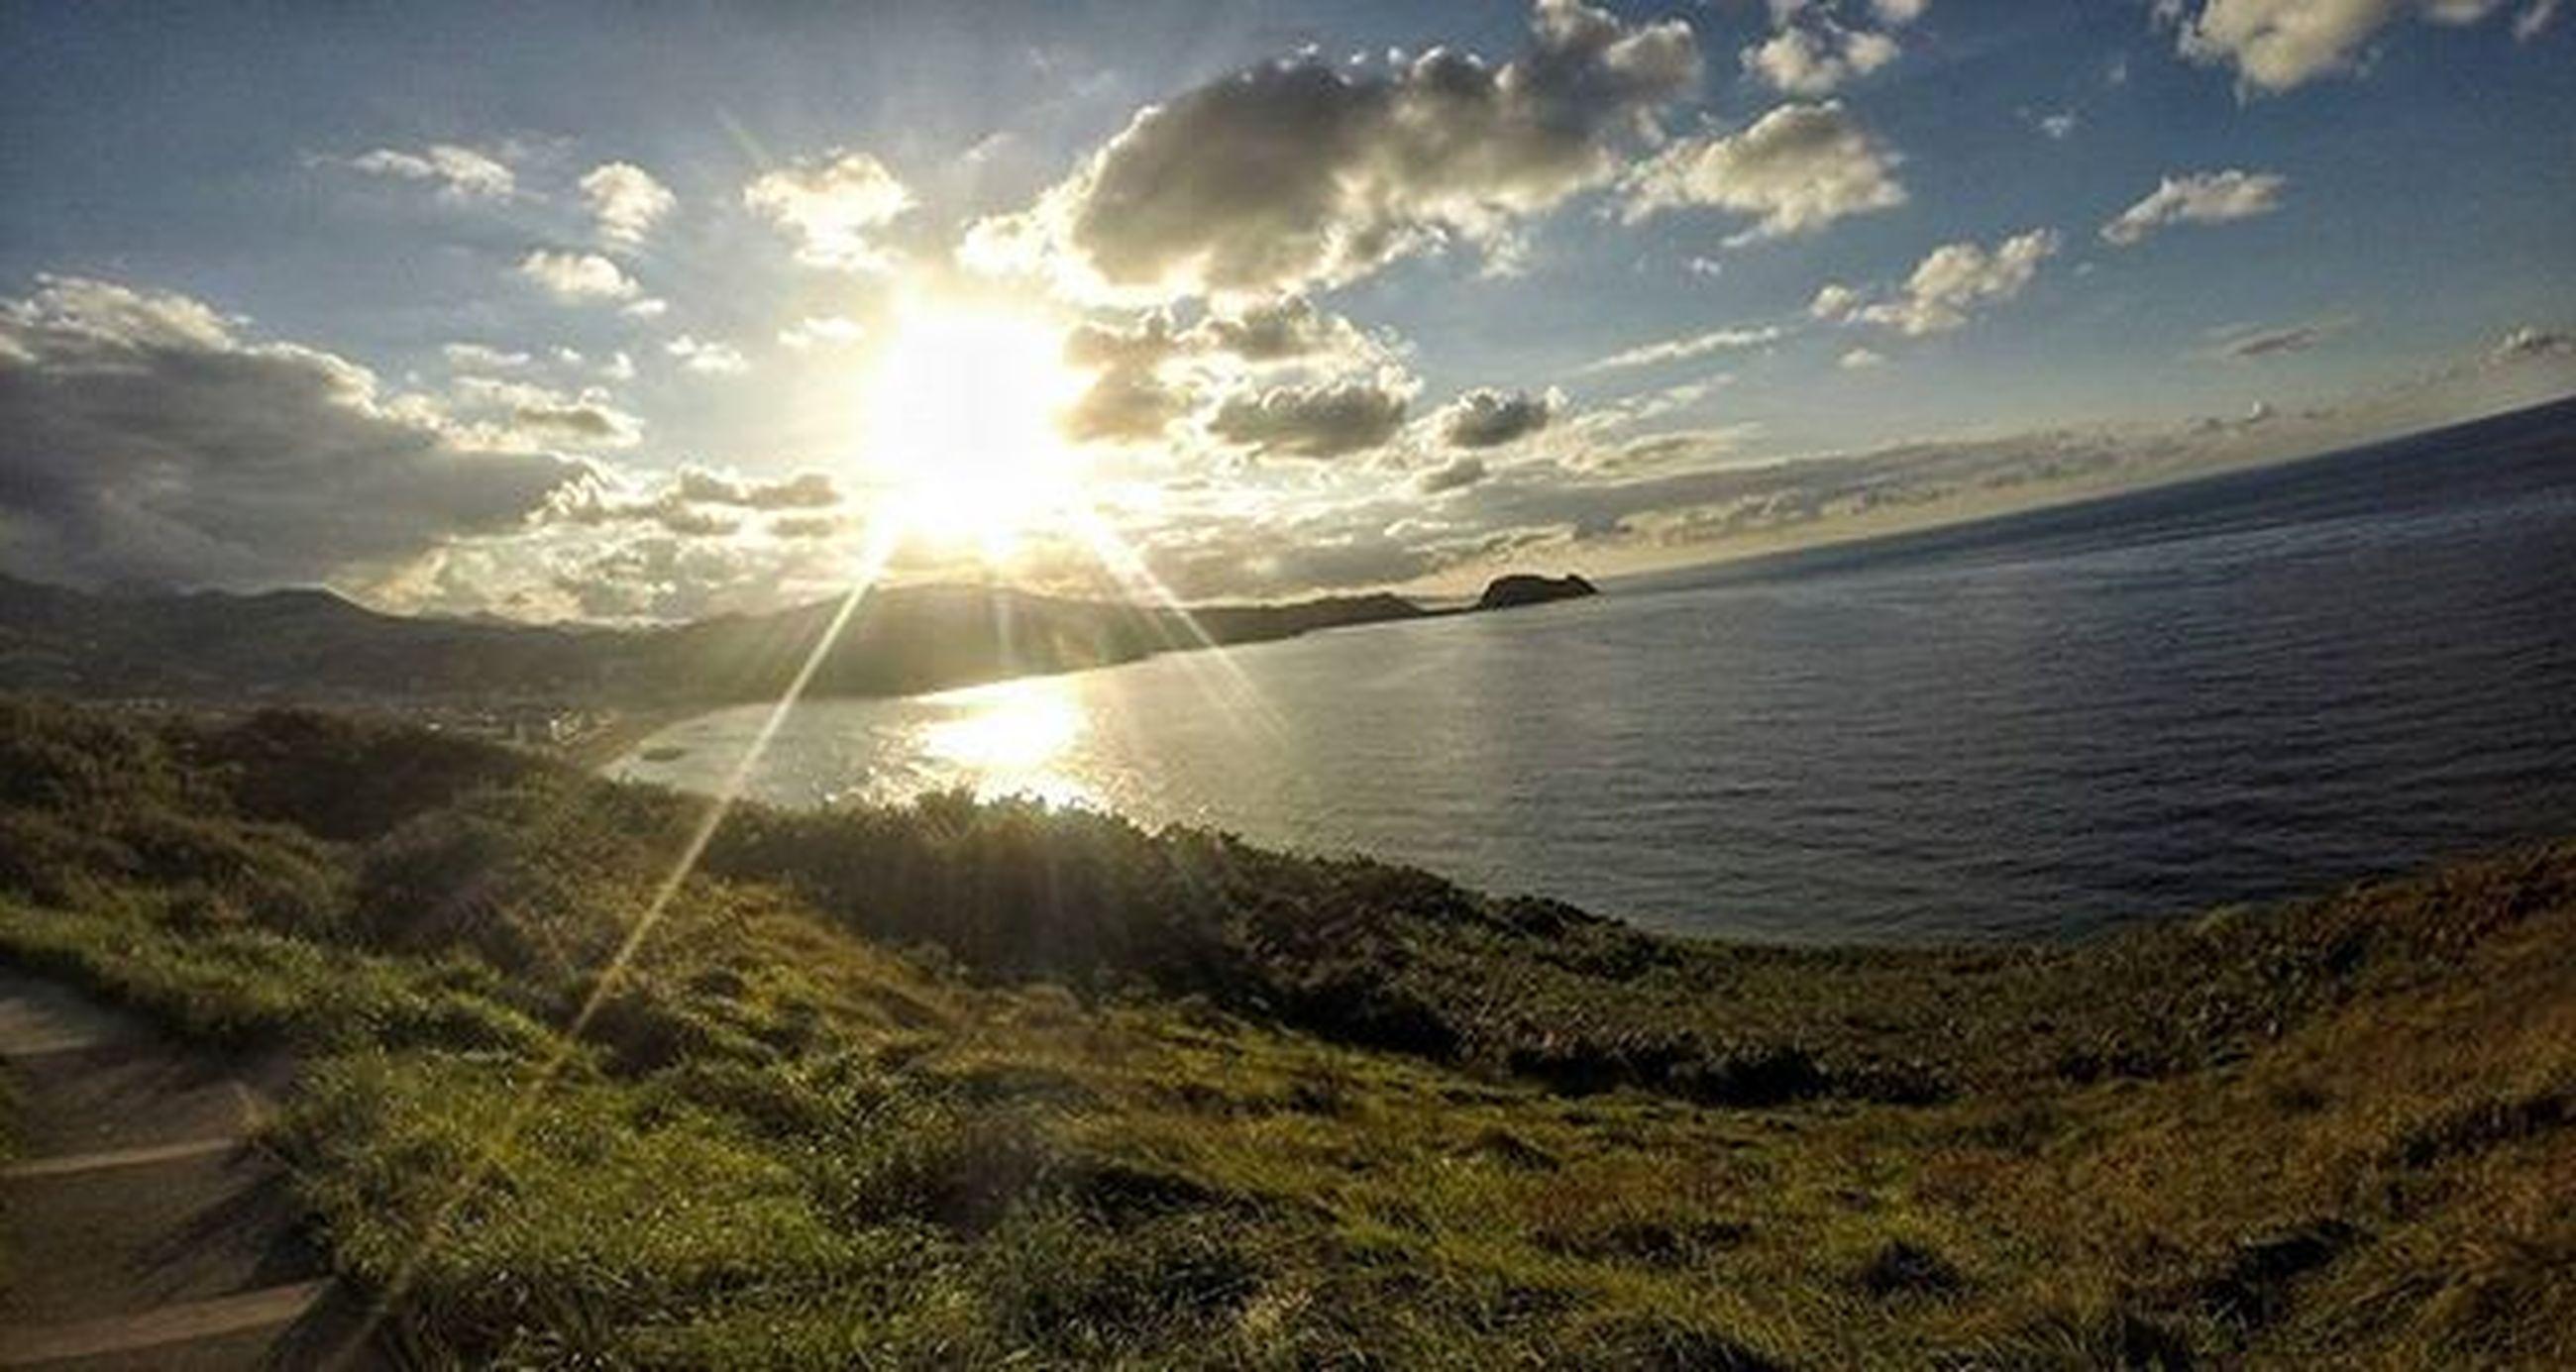 sun, tranquil scene, tranquility, sunbeam, sky, scenics, sunlight, water, beauty in nature, lens flare, nature, sunset, cloud - sky, idyllic, reflection, grass, lake, landscape, non-urban scene, cloud